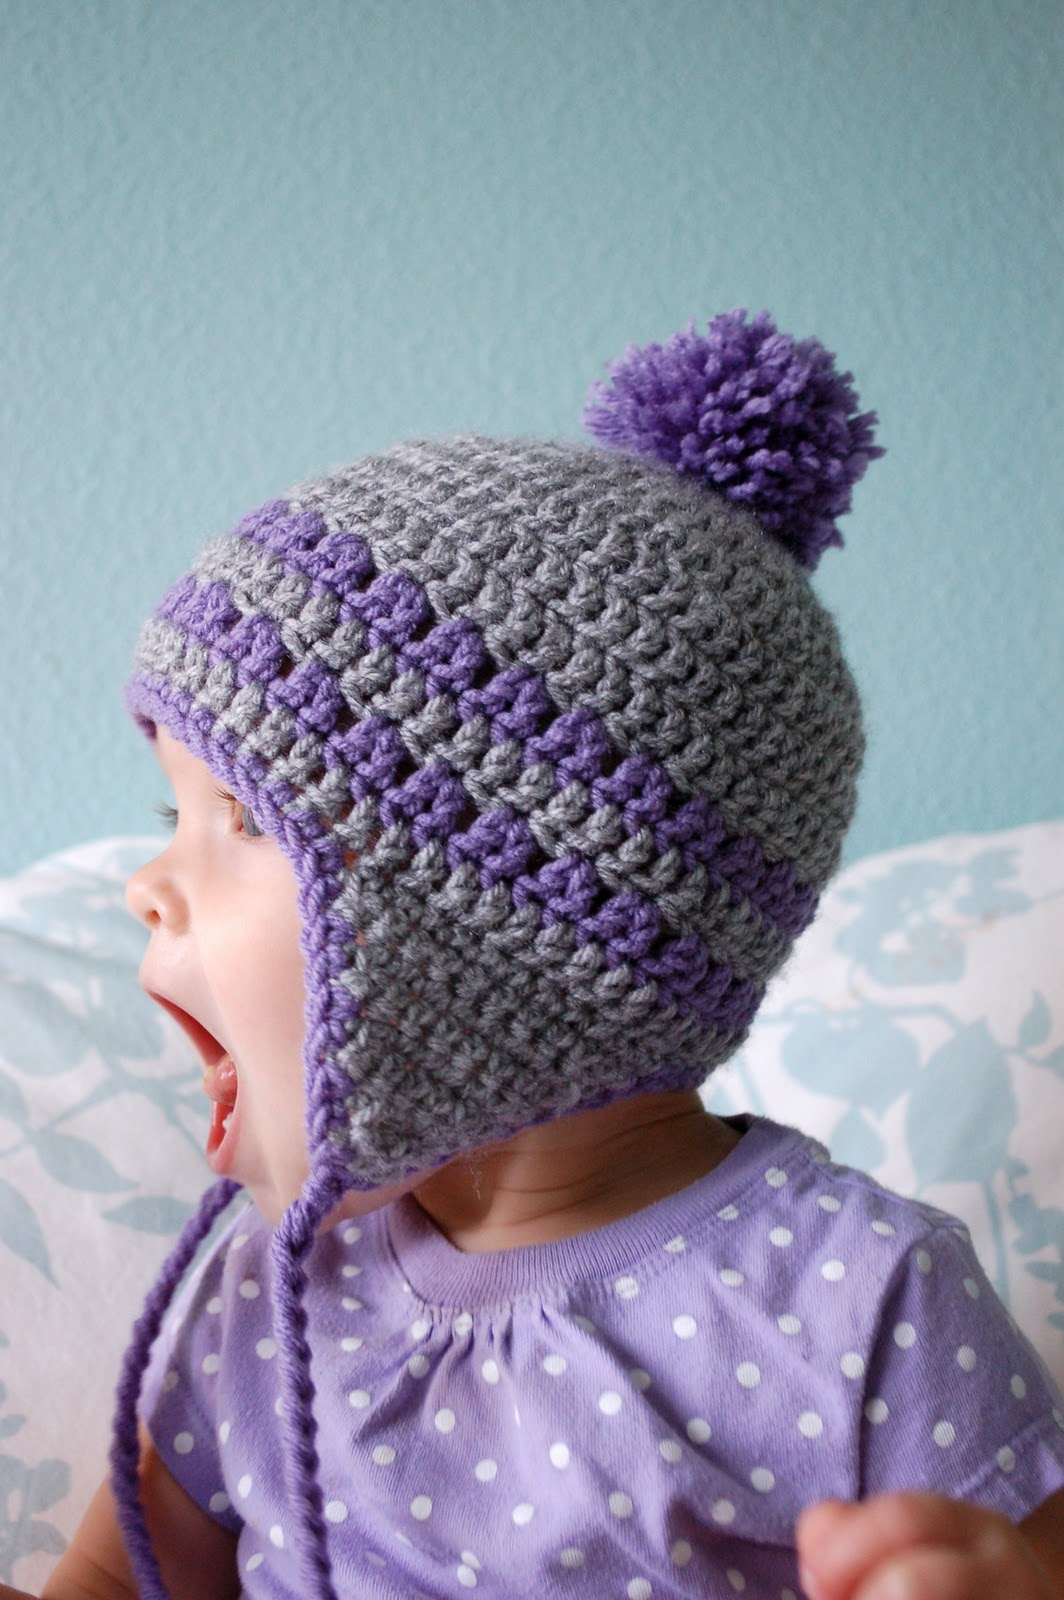 Crochet Dog Earflap Hat Pattern : Hopeful Honey Craft, Crochet, Create: 10 Free Basic ...